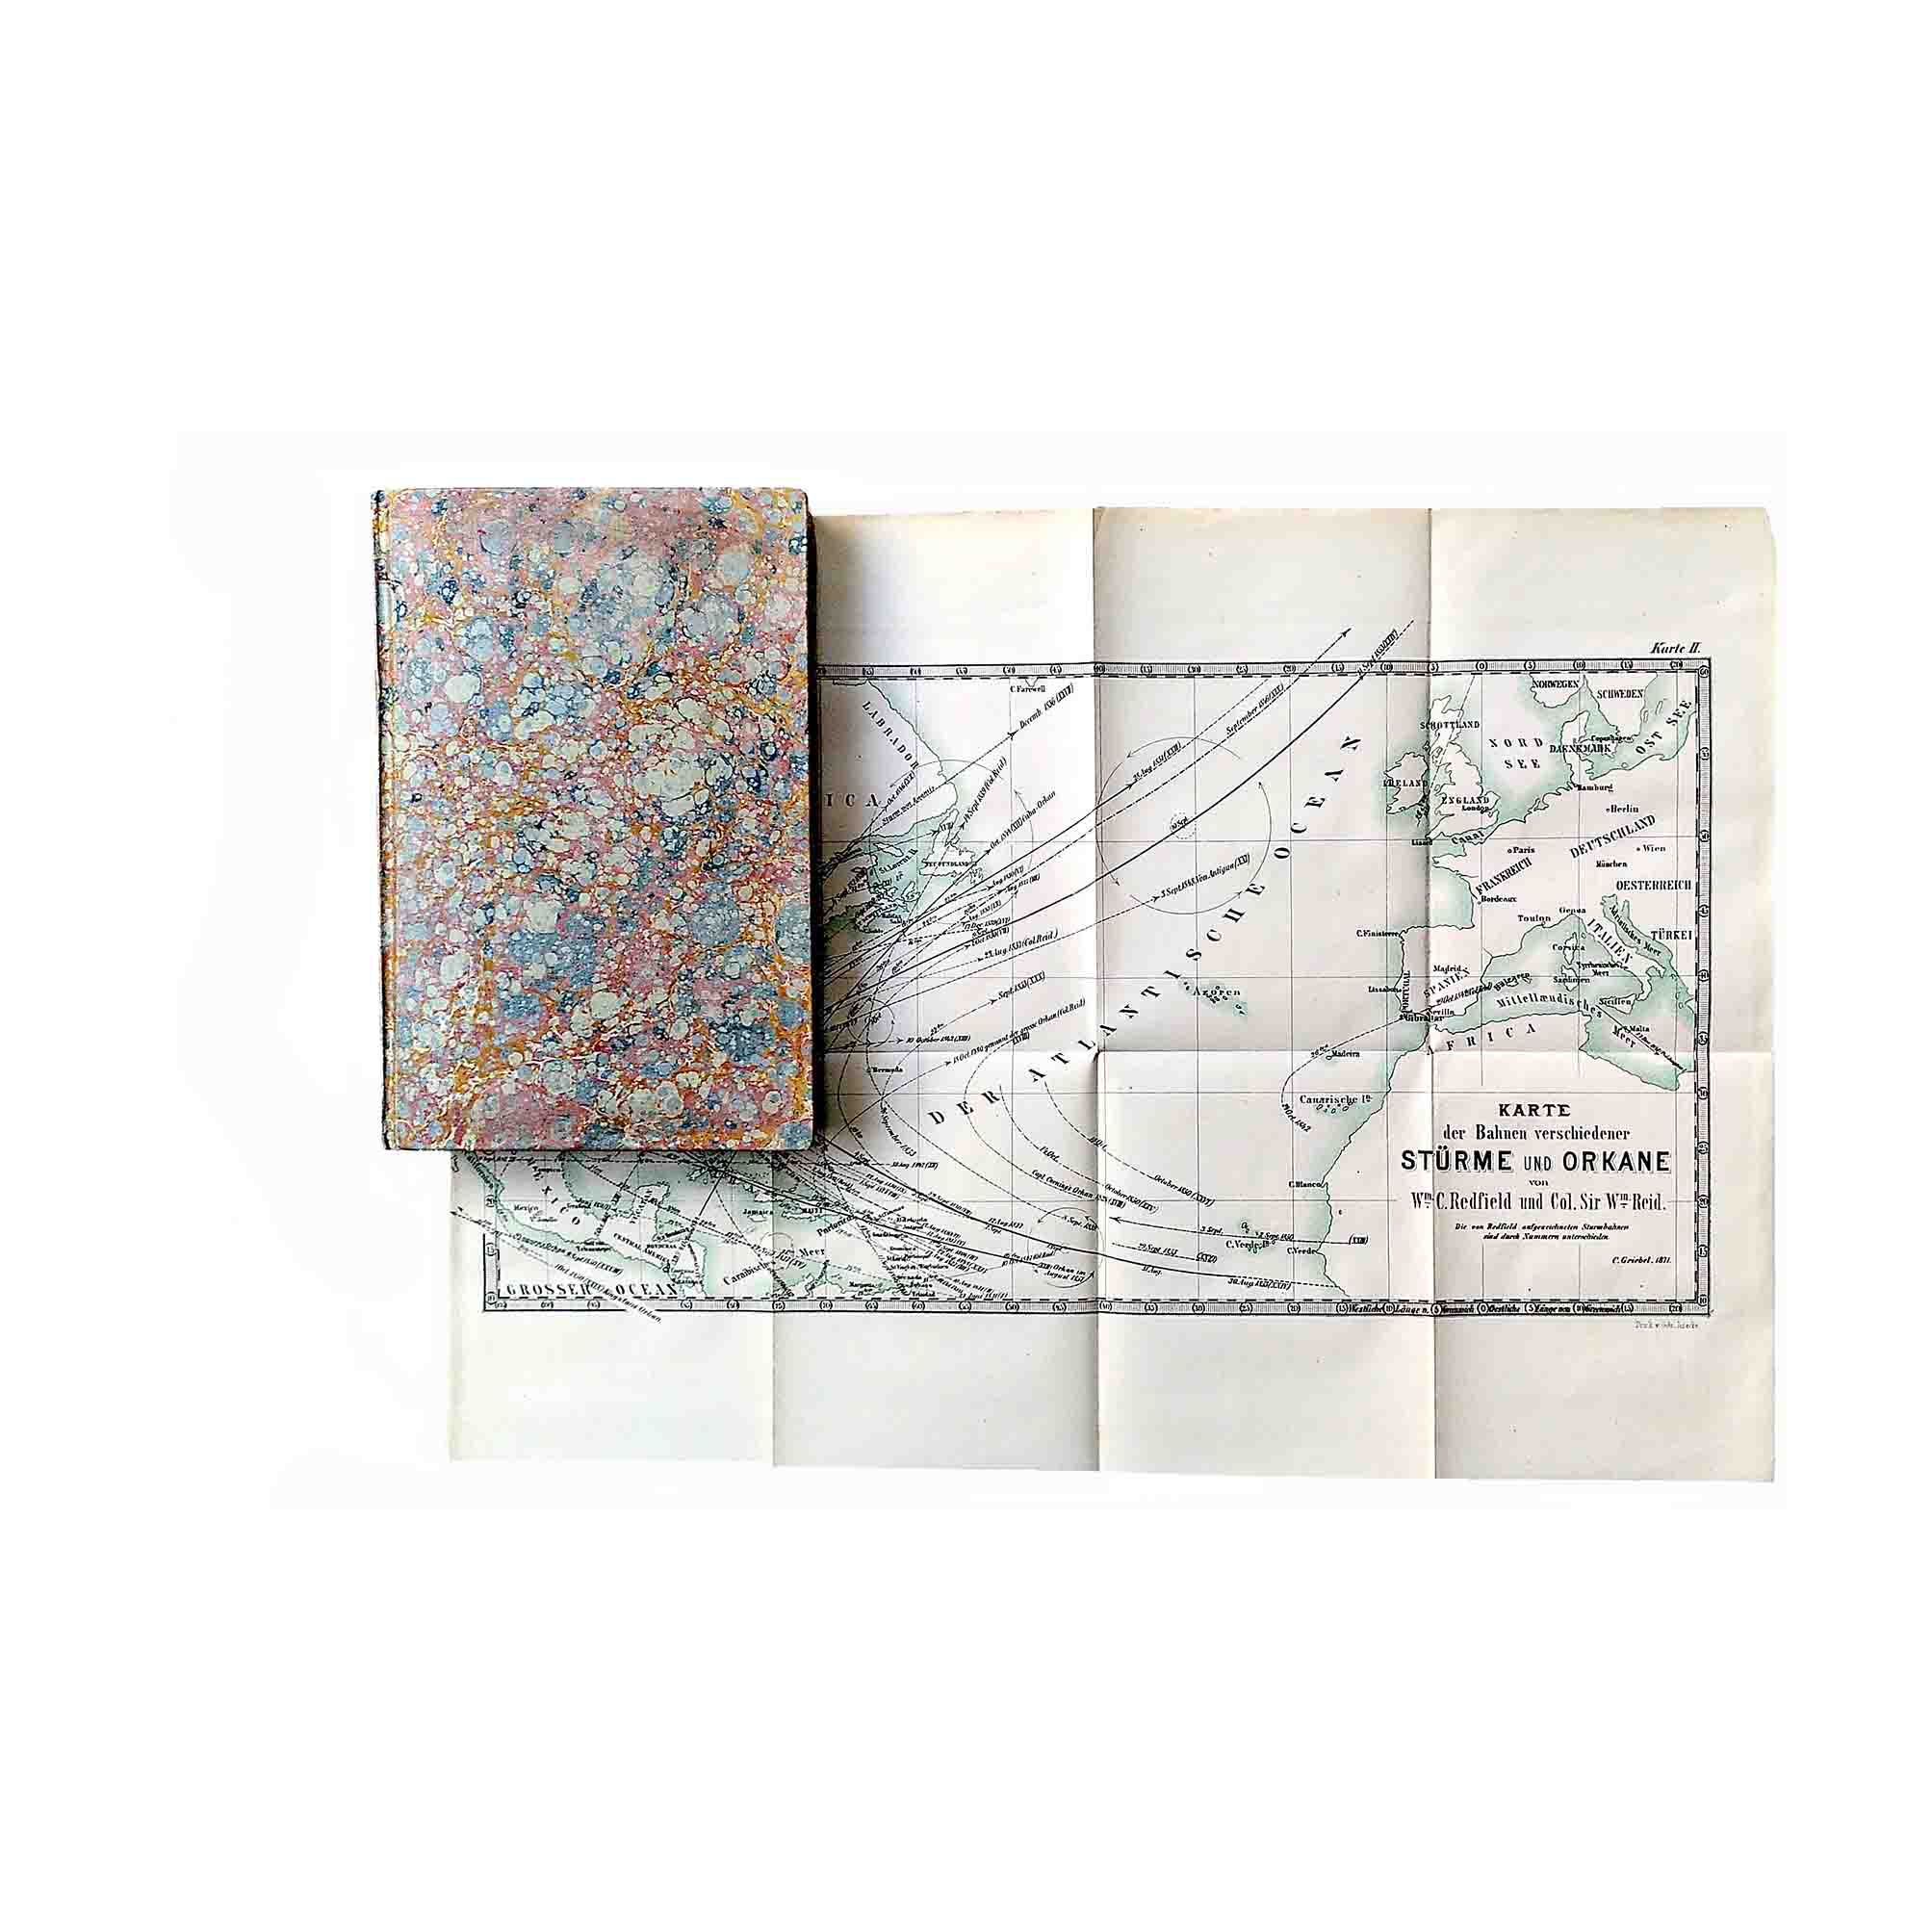 5859-Reye-Wirbelstuerme-1880-Cover-Storm-Map-A-N.jpg